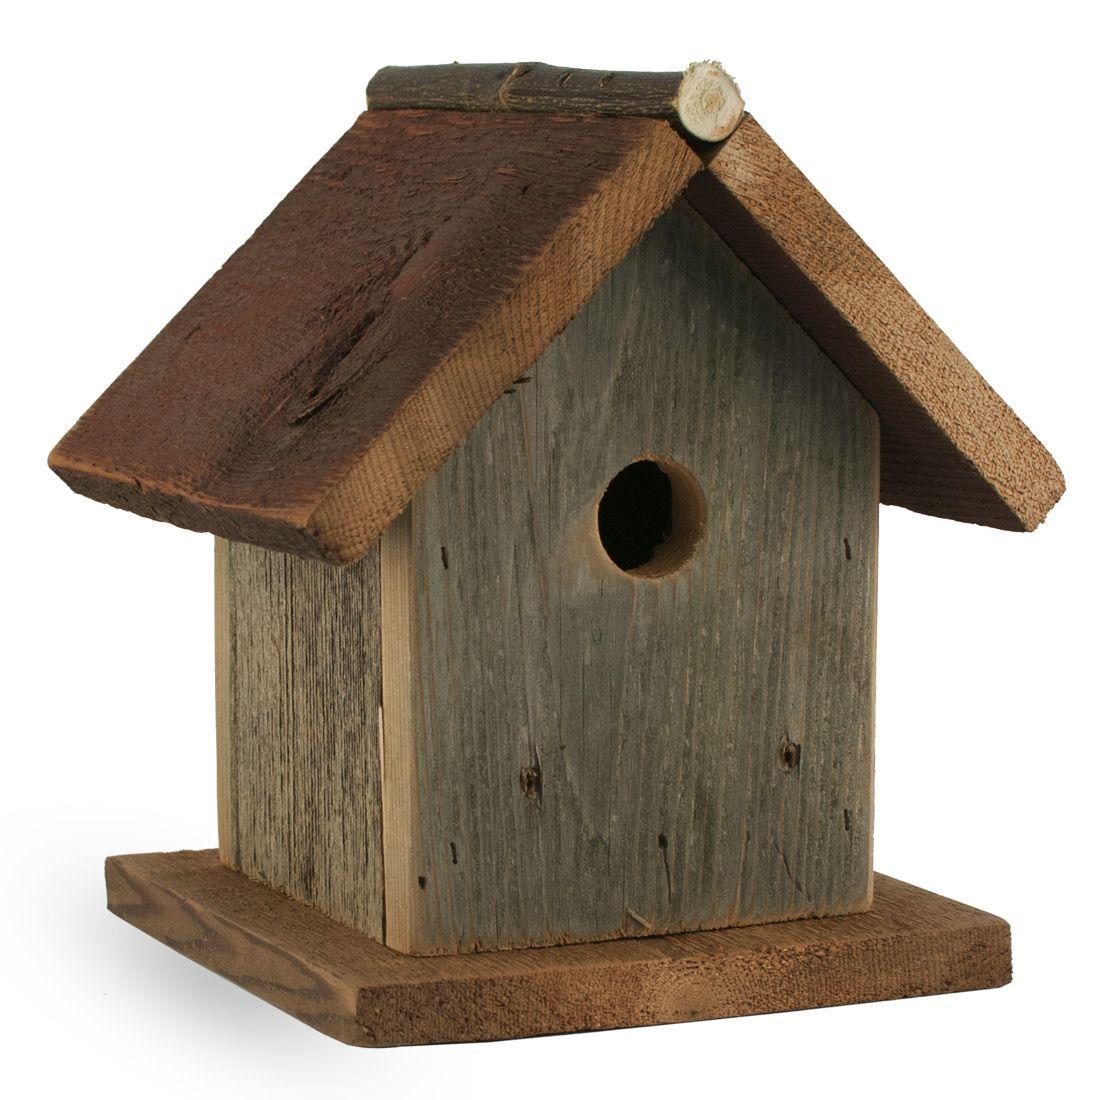 Barn wood bird house foothills wood factory garden - Old barn wood bird houses ...